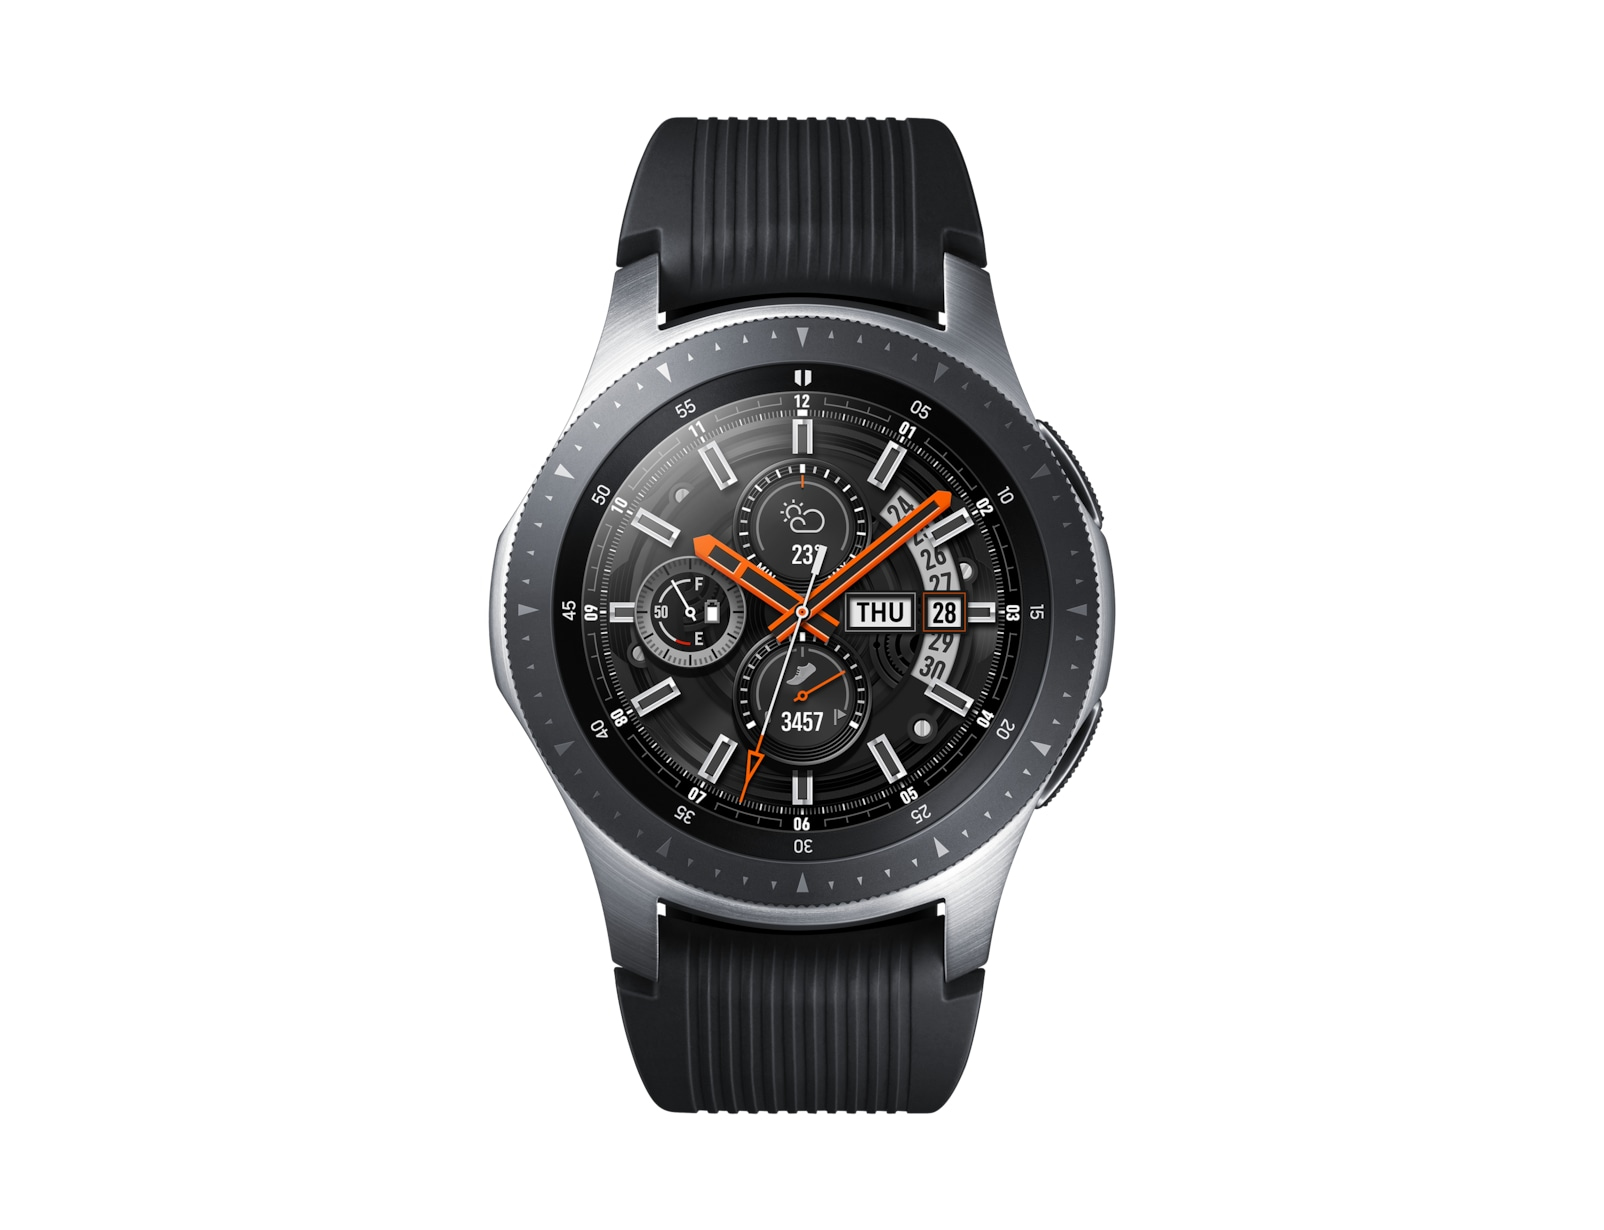 Samsung Galaxy Watch smartwatch SAMOLED 3.3 cm (1.3